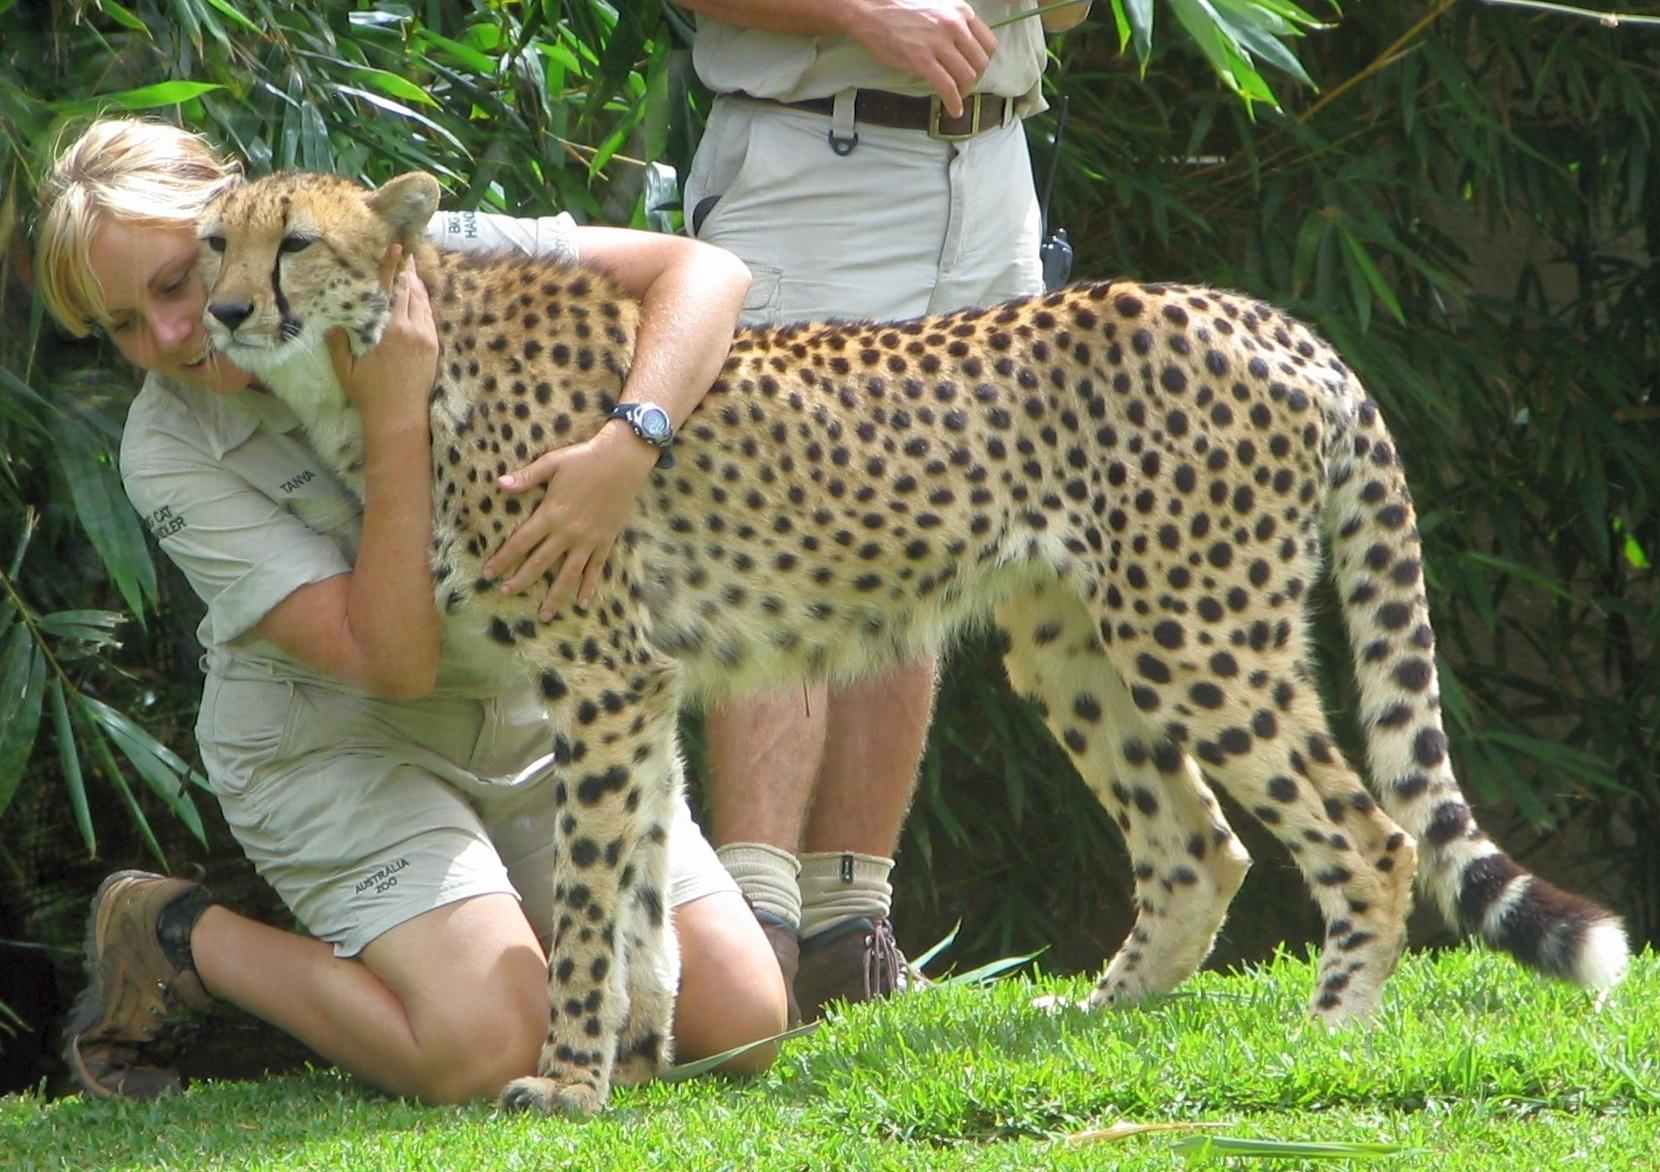 File:Australia Zoo cheetah and zookeepers.jpg - Wikipedia